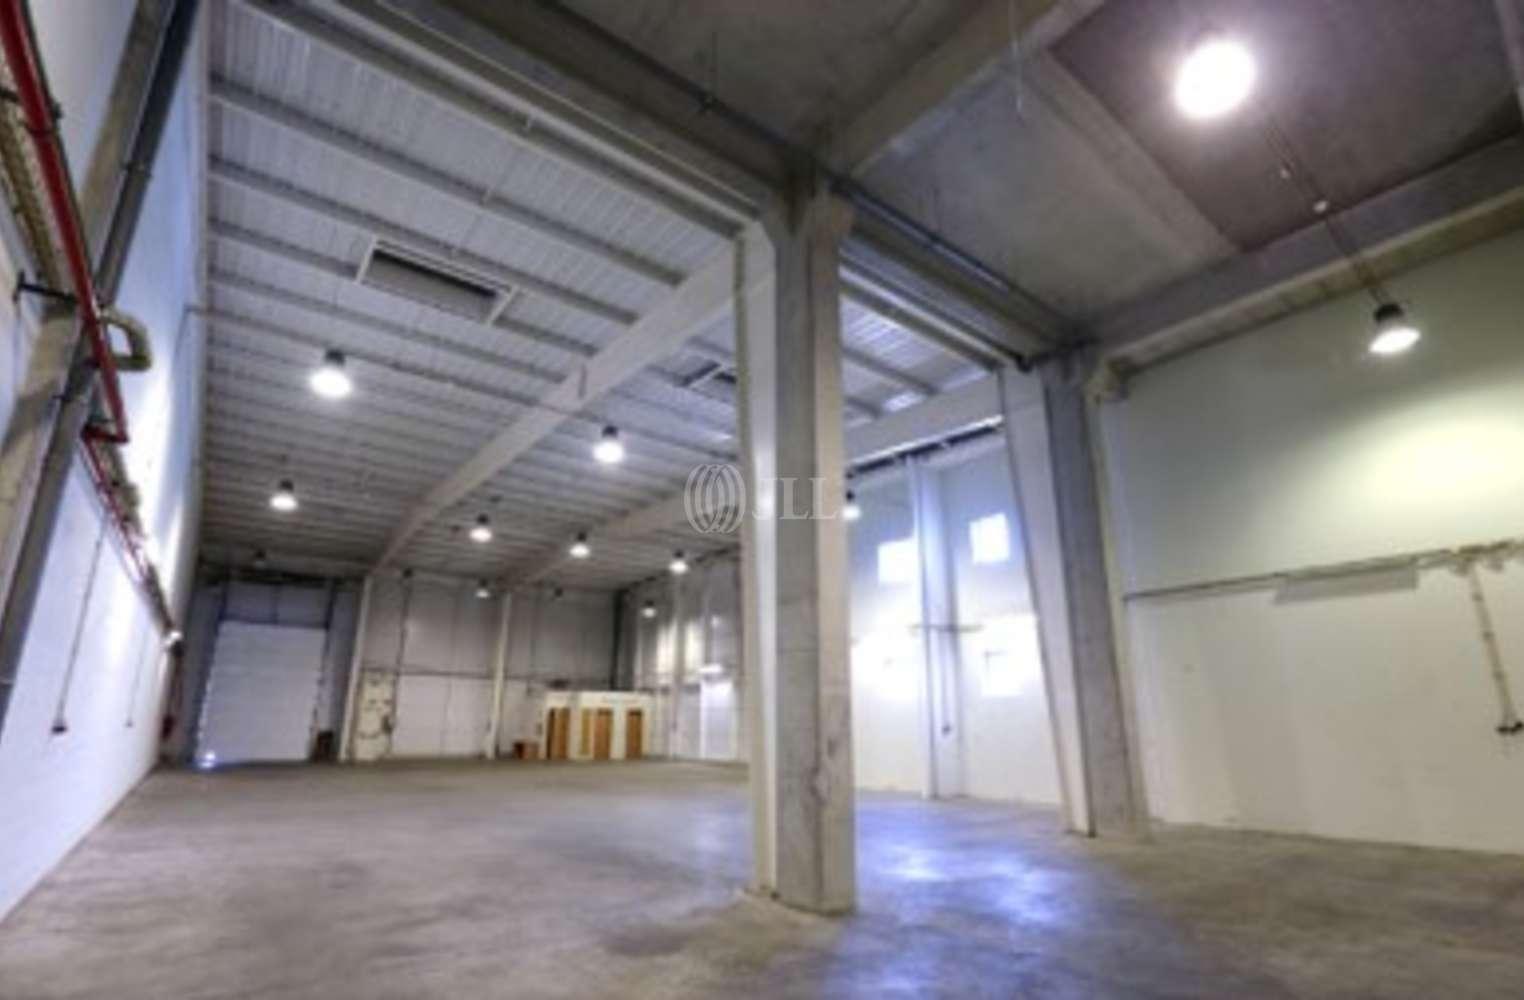 Industrial Sintra, 2710-089 - Sintra Business Park 4 - (Arm/Esc) - 3